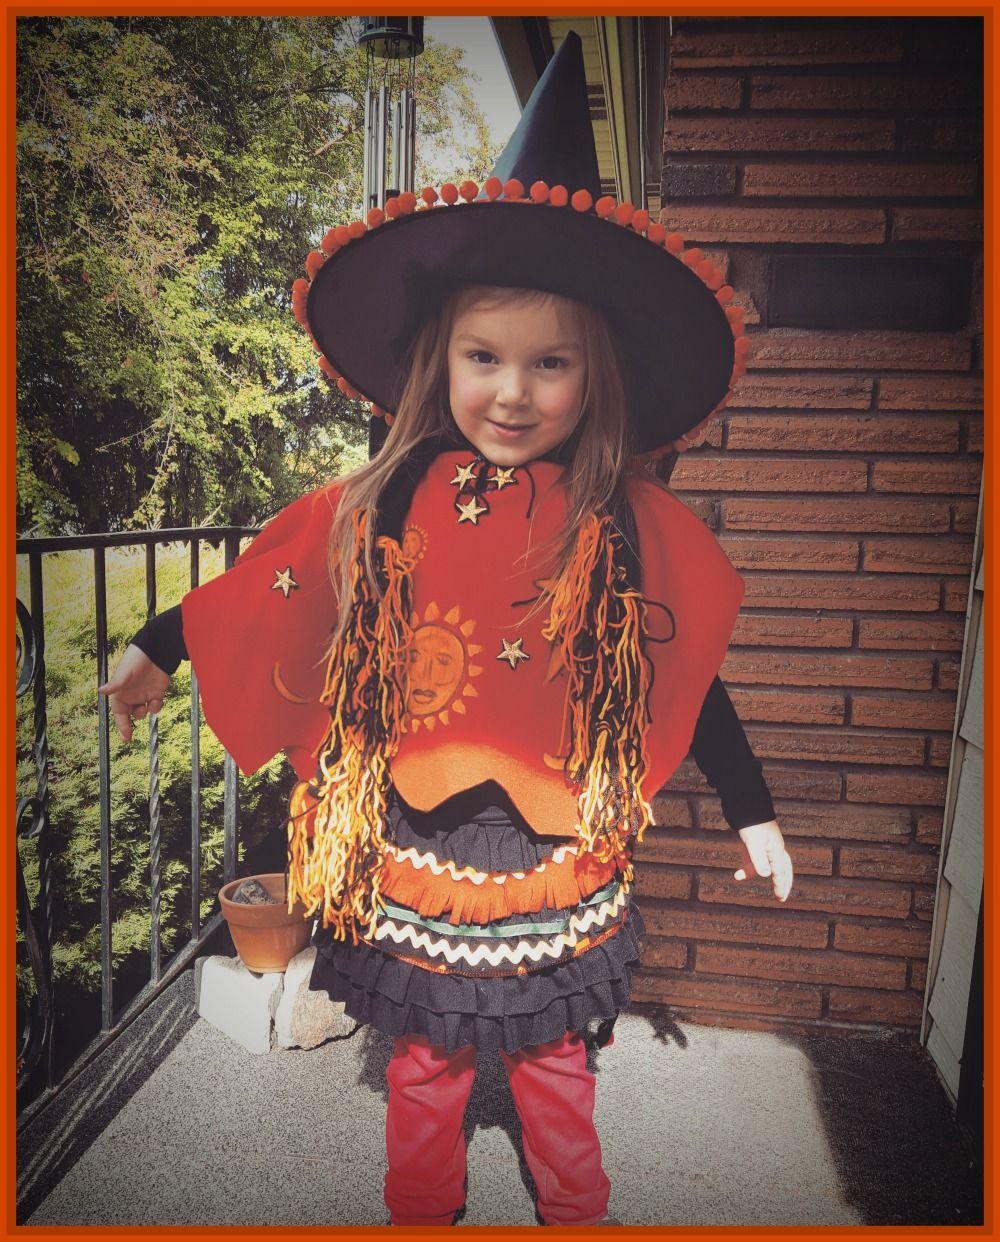 Image Result For Dani Dennison Hocus Pocus Costume Hocus Pocus Costume Halloween Costumes Pictures Halloween Photoshoot